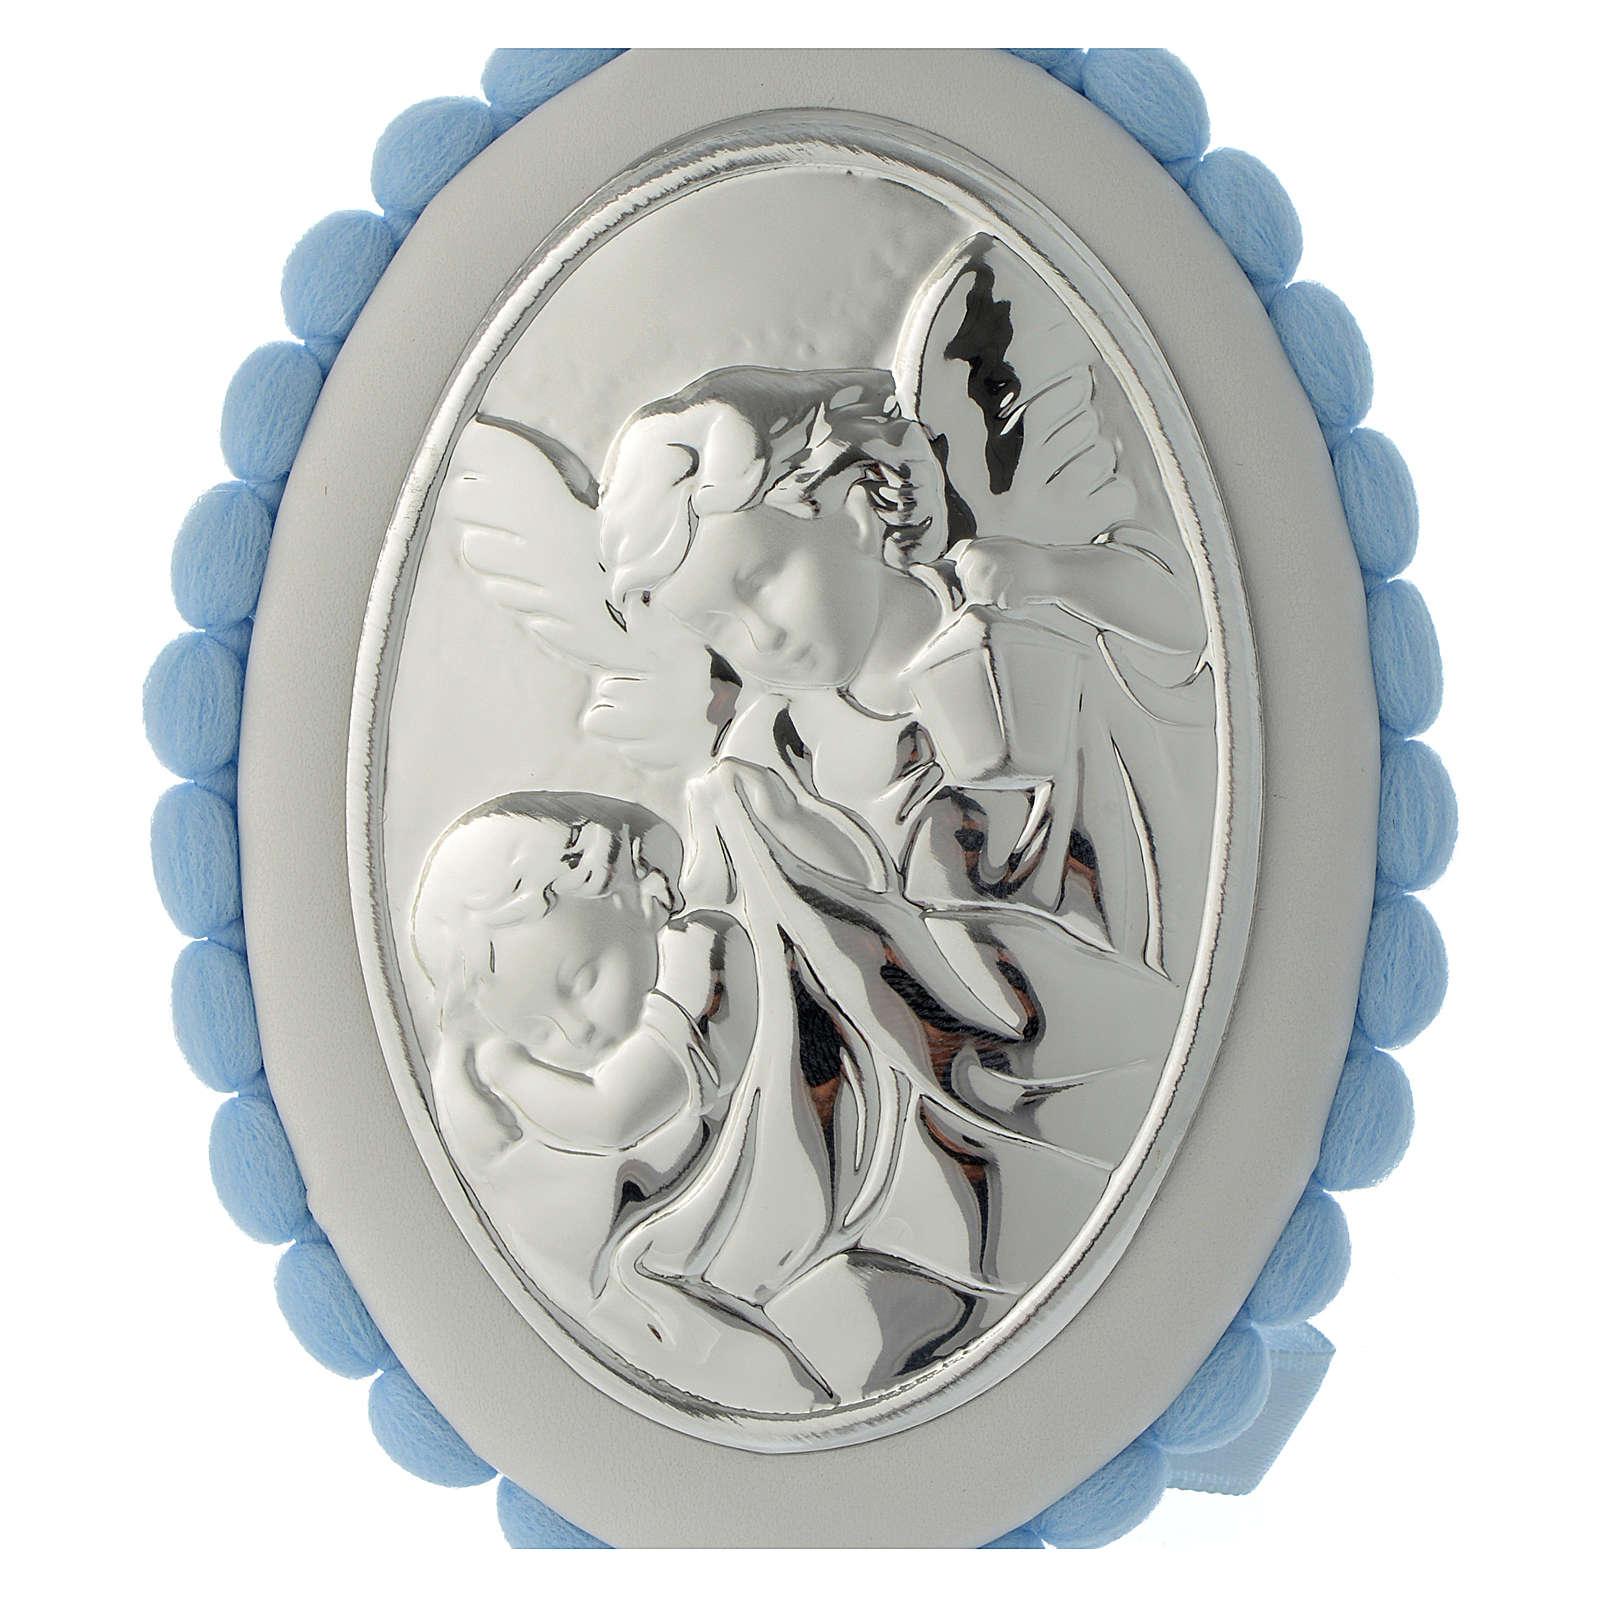 Medalla para cuna celeste pompón Ángel carillón 4